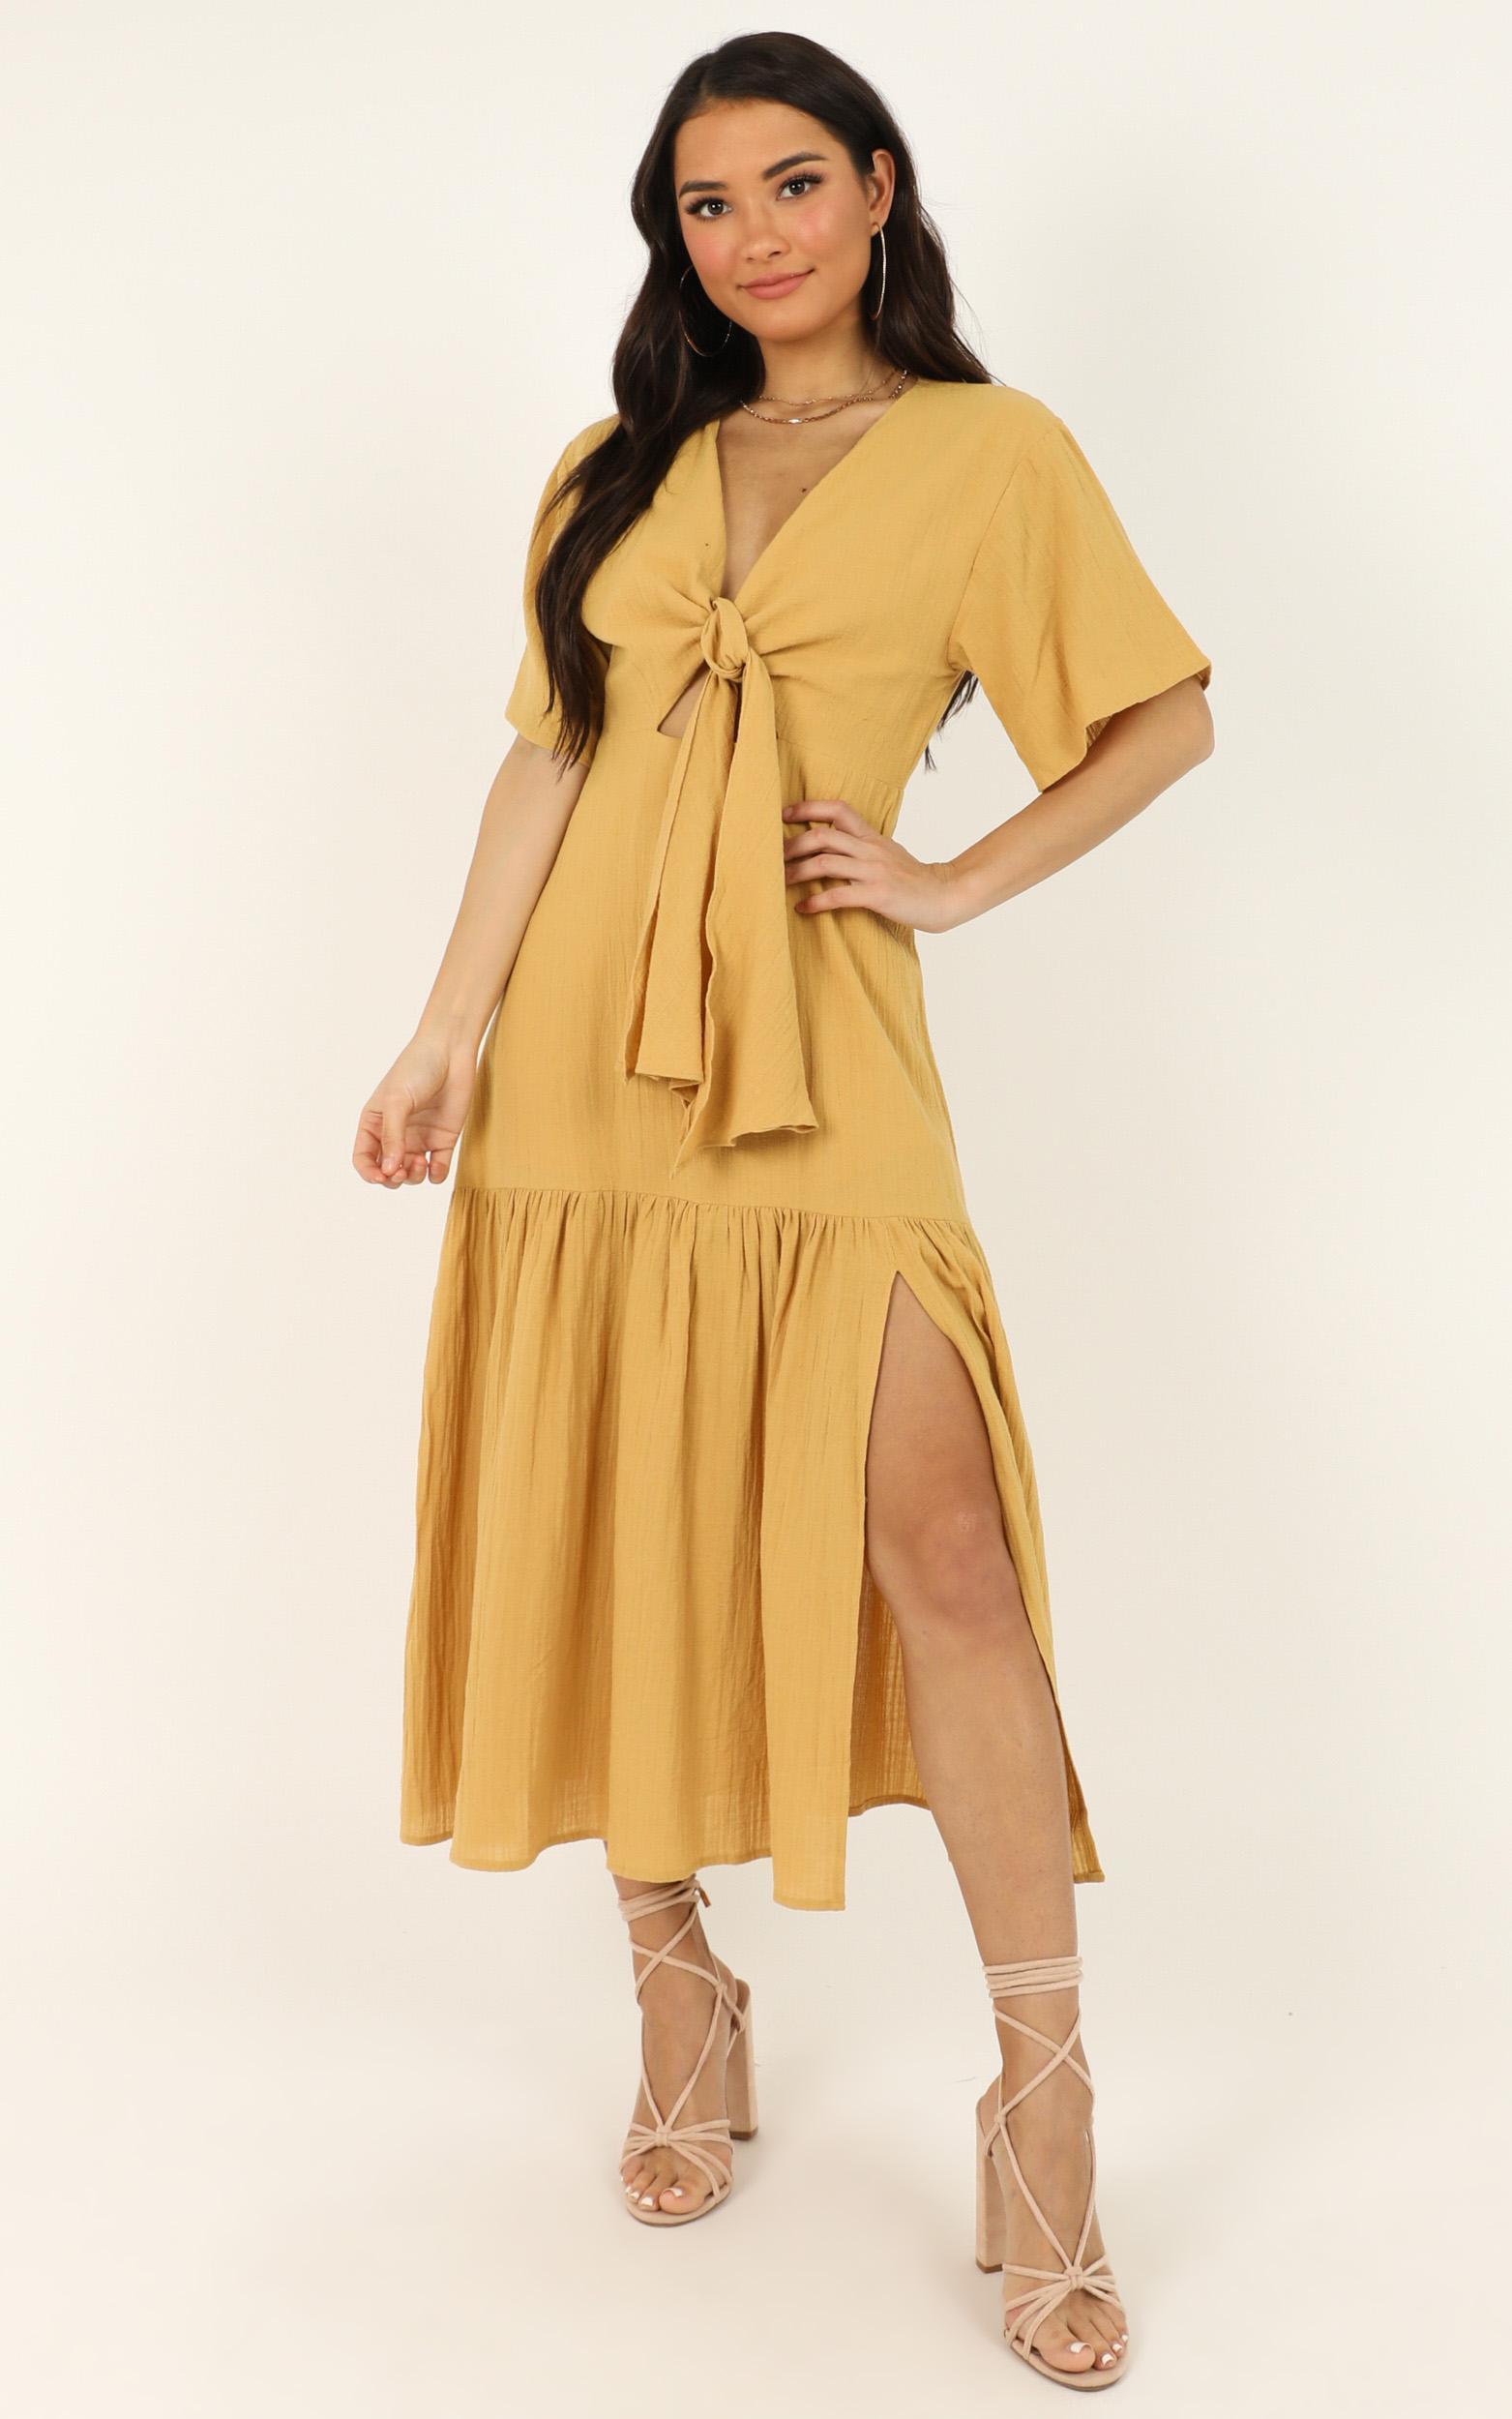 Main Attraction Dress in mustard - 20 (XXXXL), Mustard, hi-res image number null